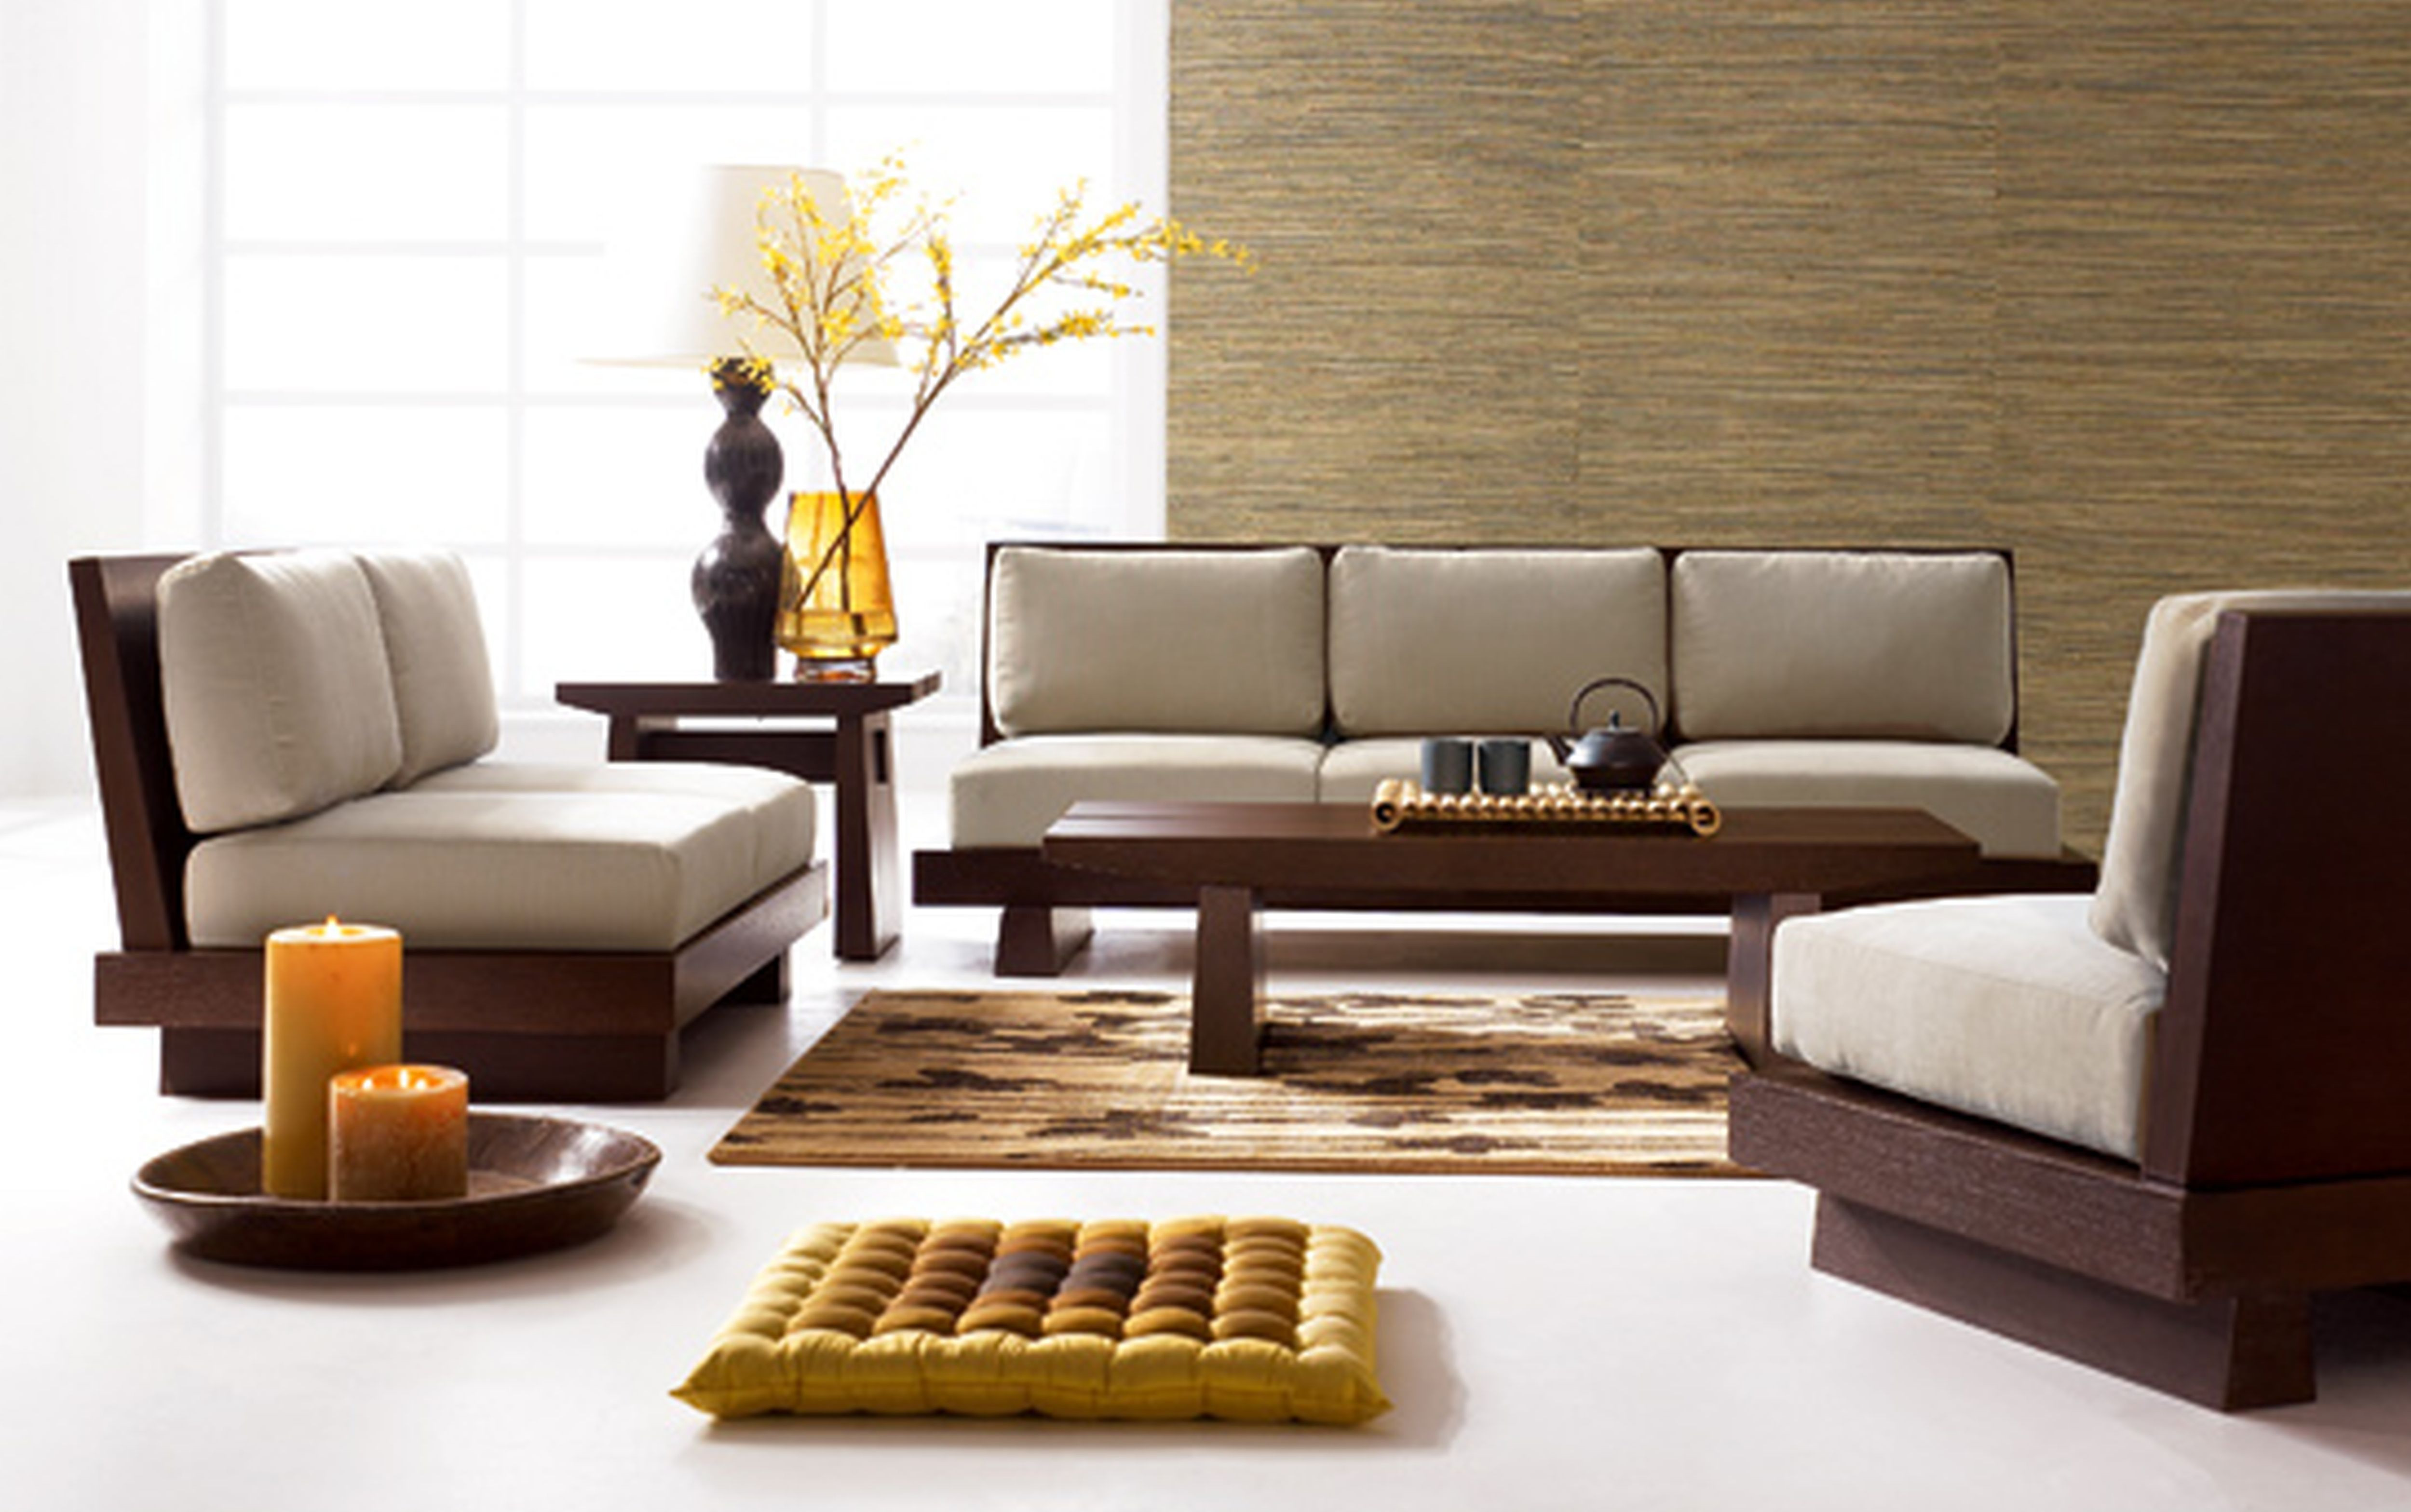 Best ideas about Modern Living Room Furniture Ideas . Save or Pin Modern Living Room Furniture Ideas — MODERN HOUSE PLAN Now.